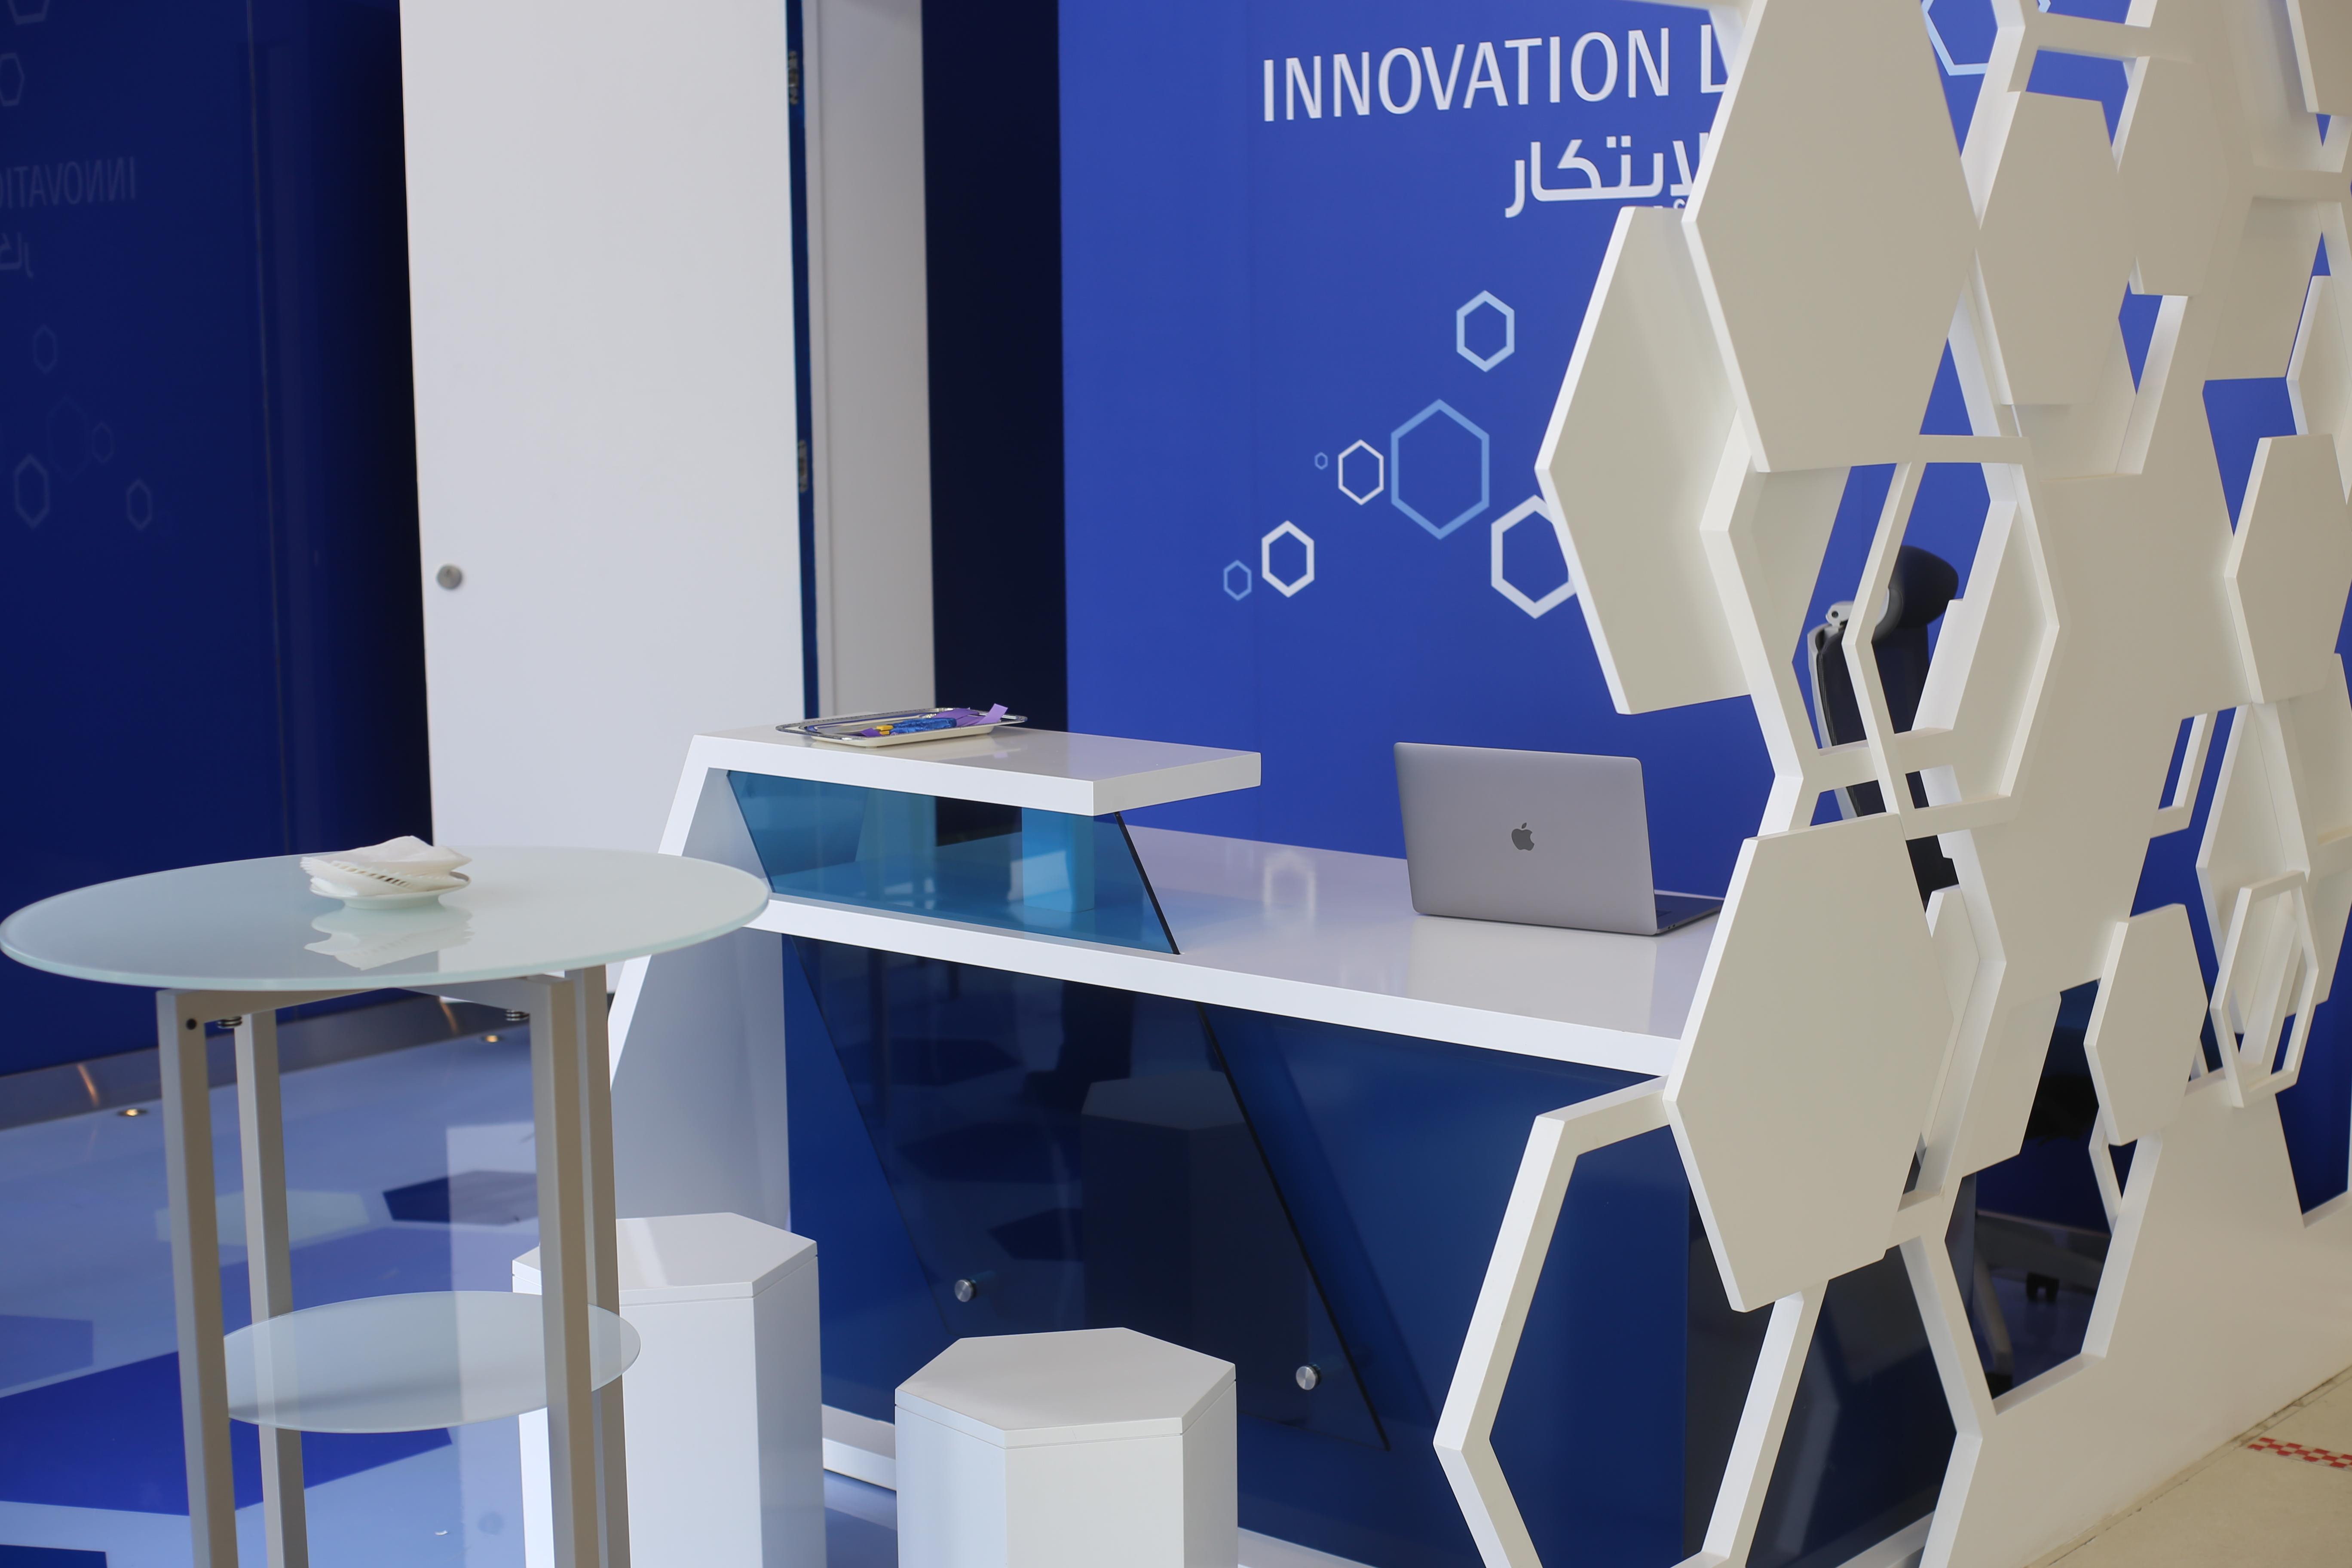 Innovation Lab, in Mohammadia, Riyadh